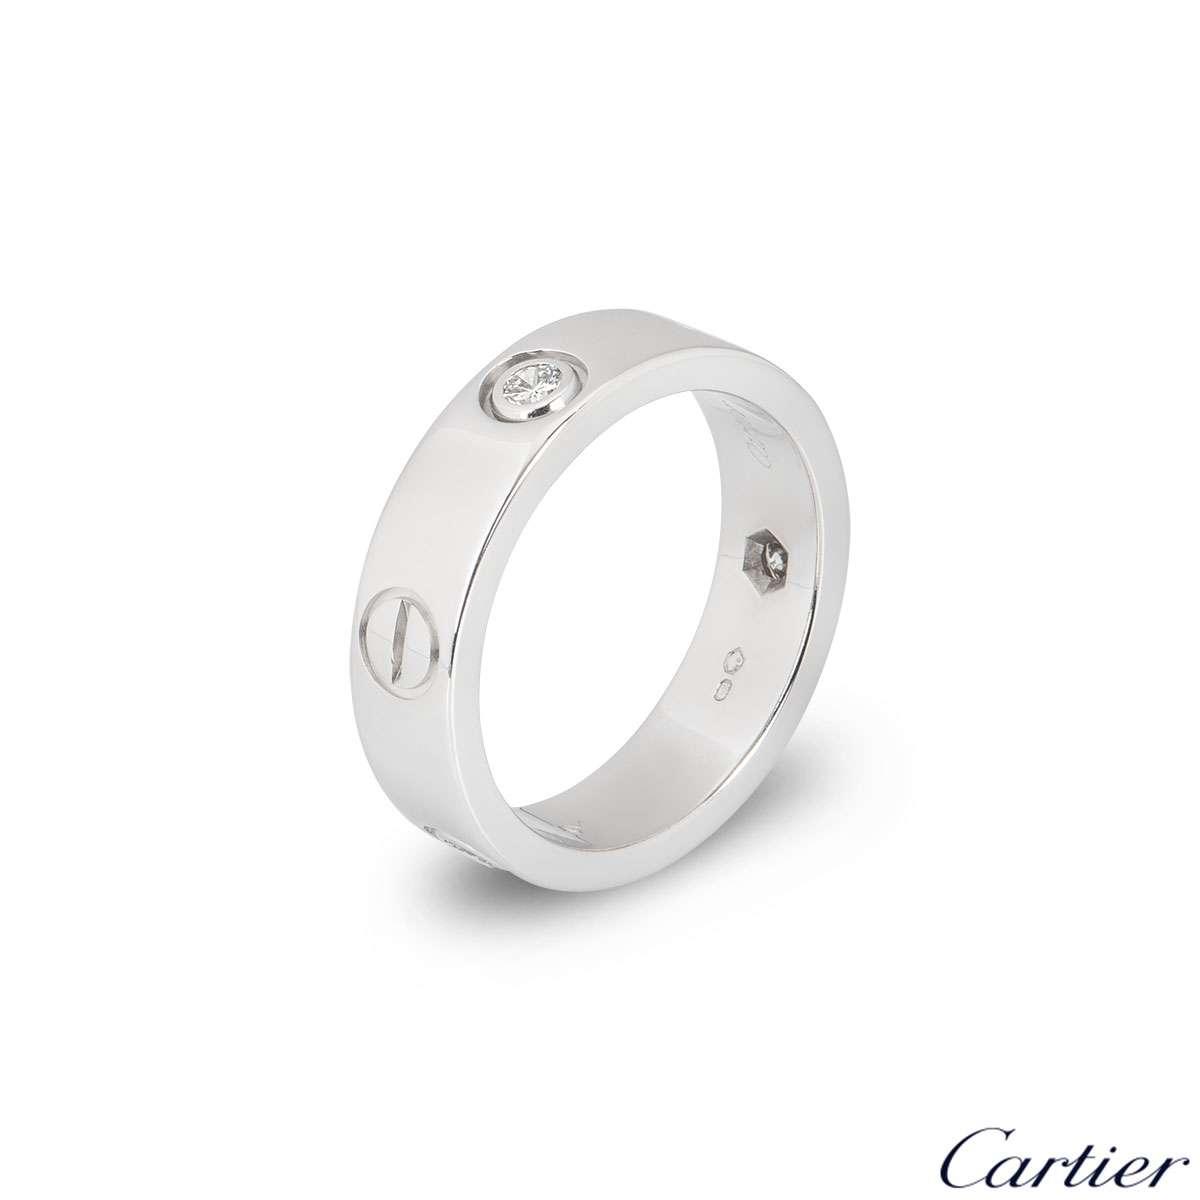 Cartier White Gold Half Diamond Love Ring Size 55 B4032500